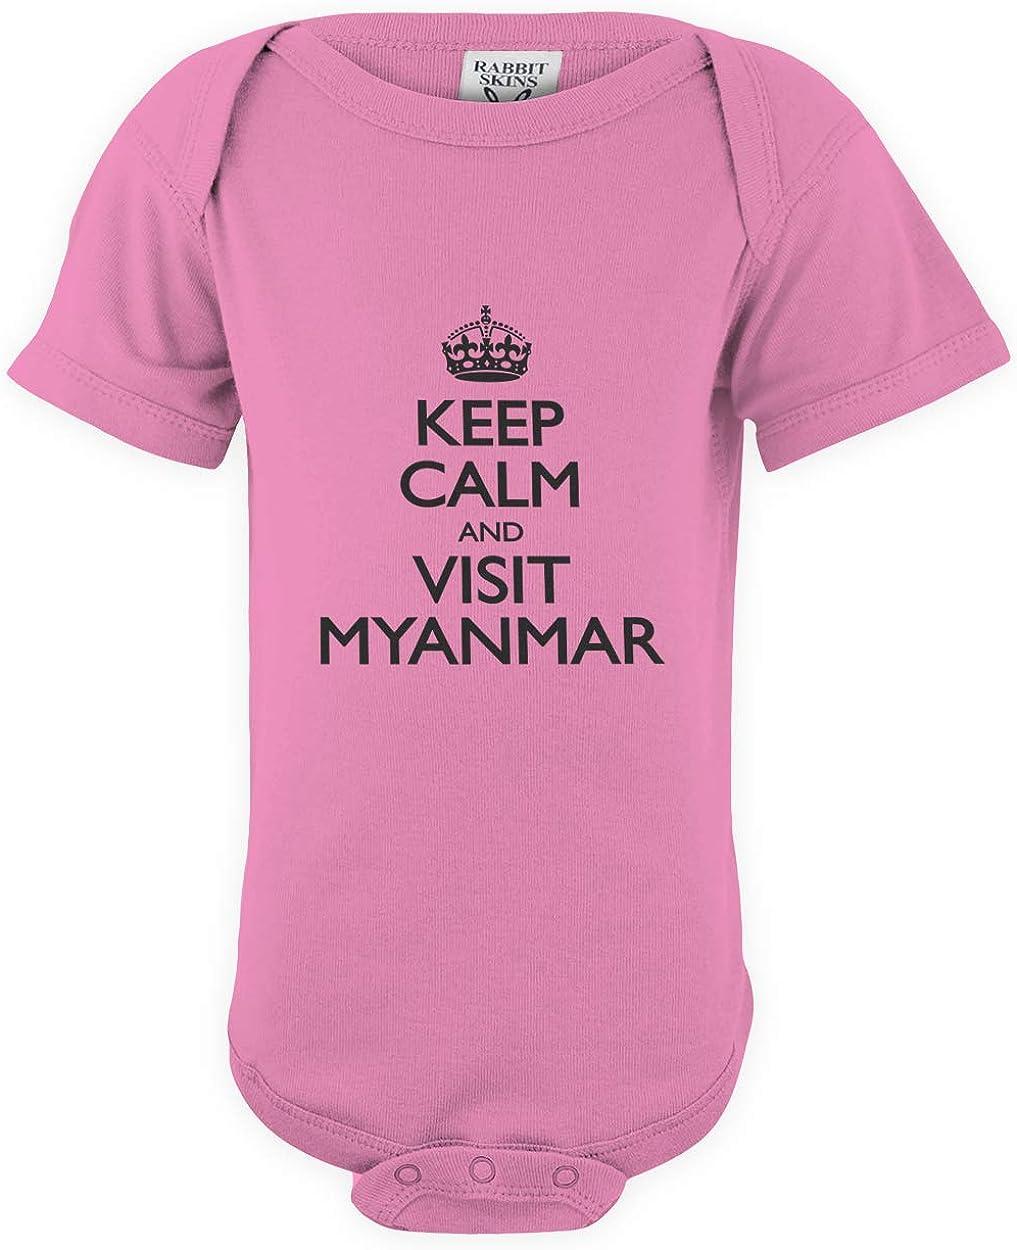 B07QJV1SYT shirtloco Baby Keep Calm and Visit Myanmar Infant Bodysuit 61QYDC2RuOL